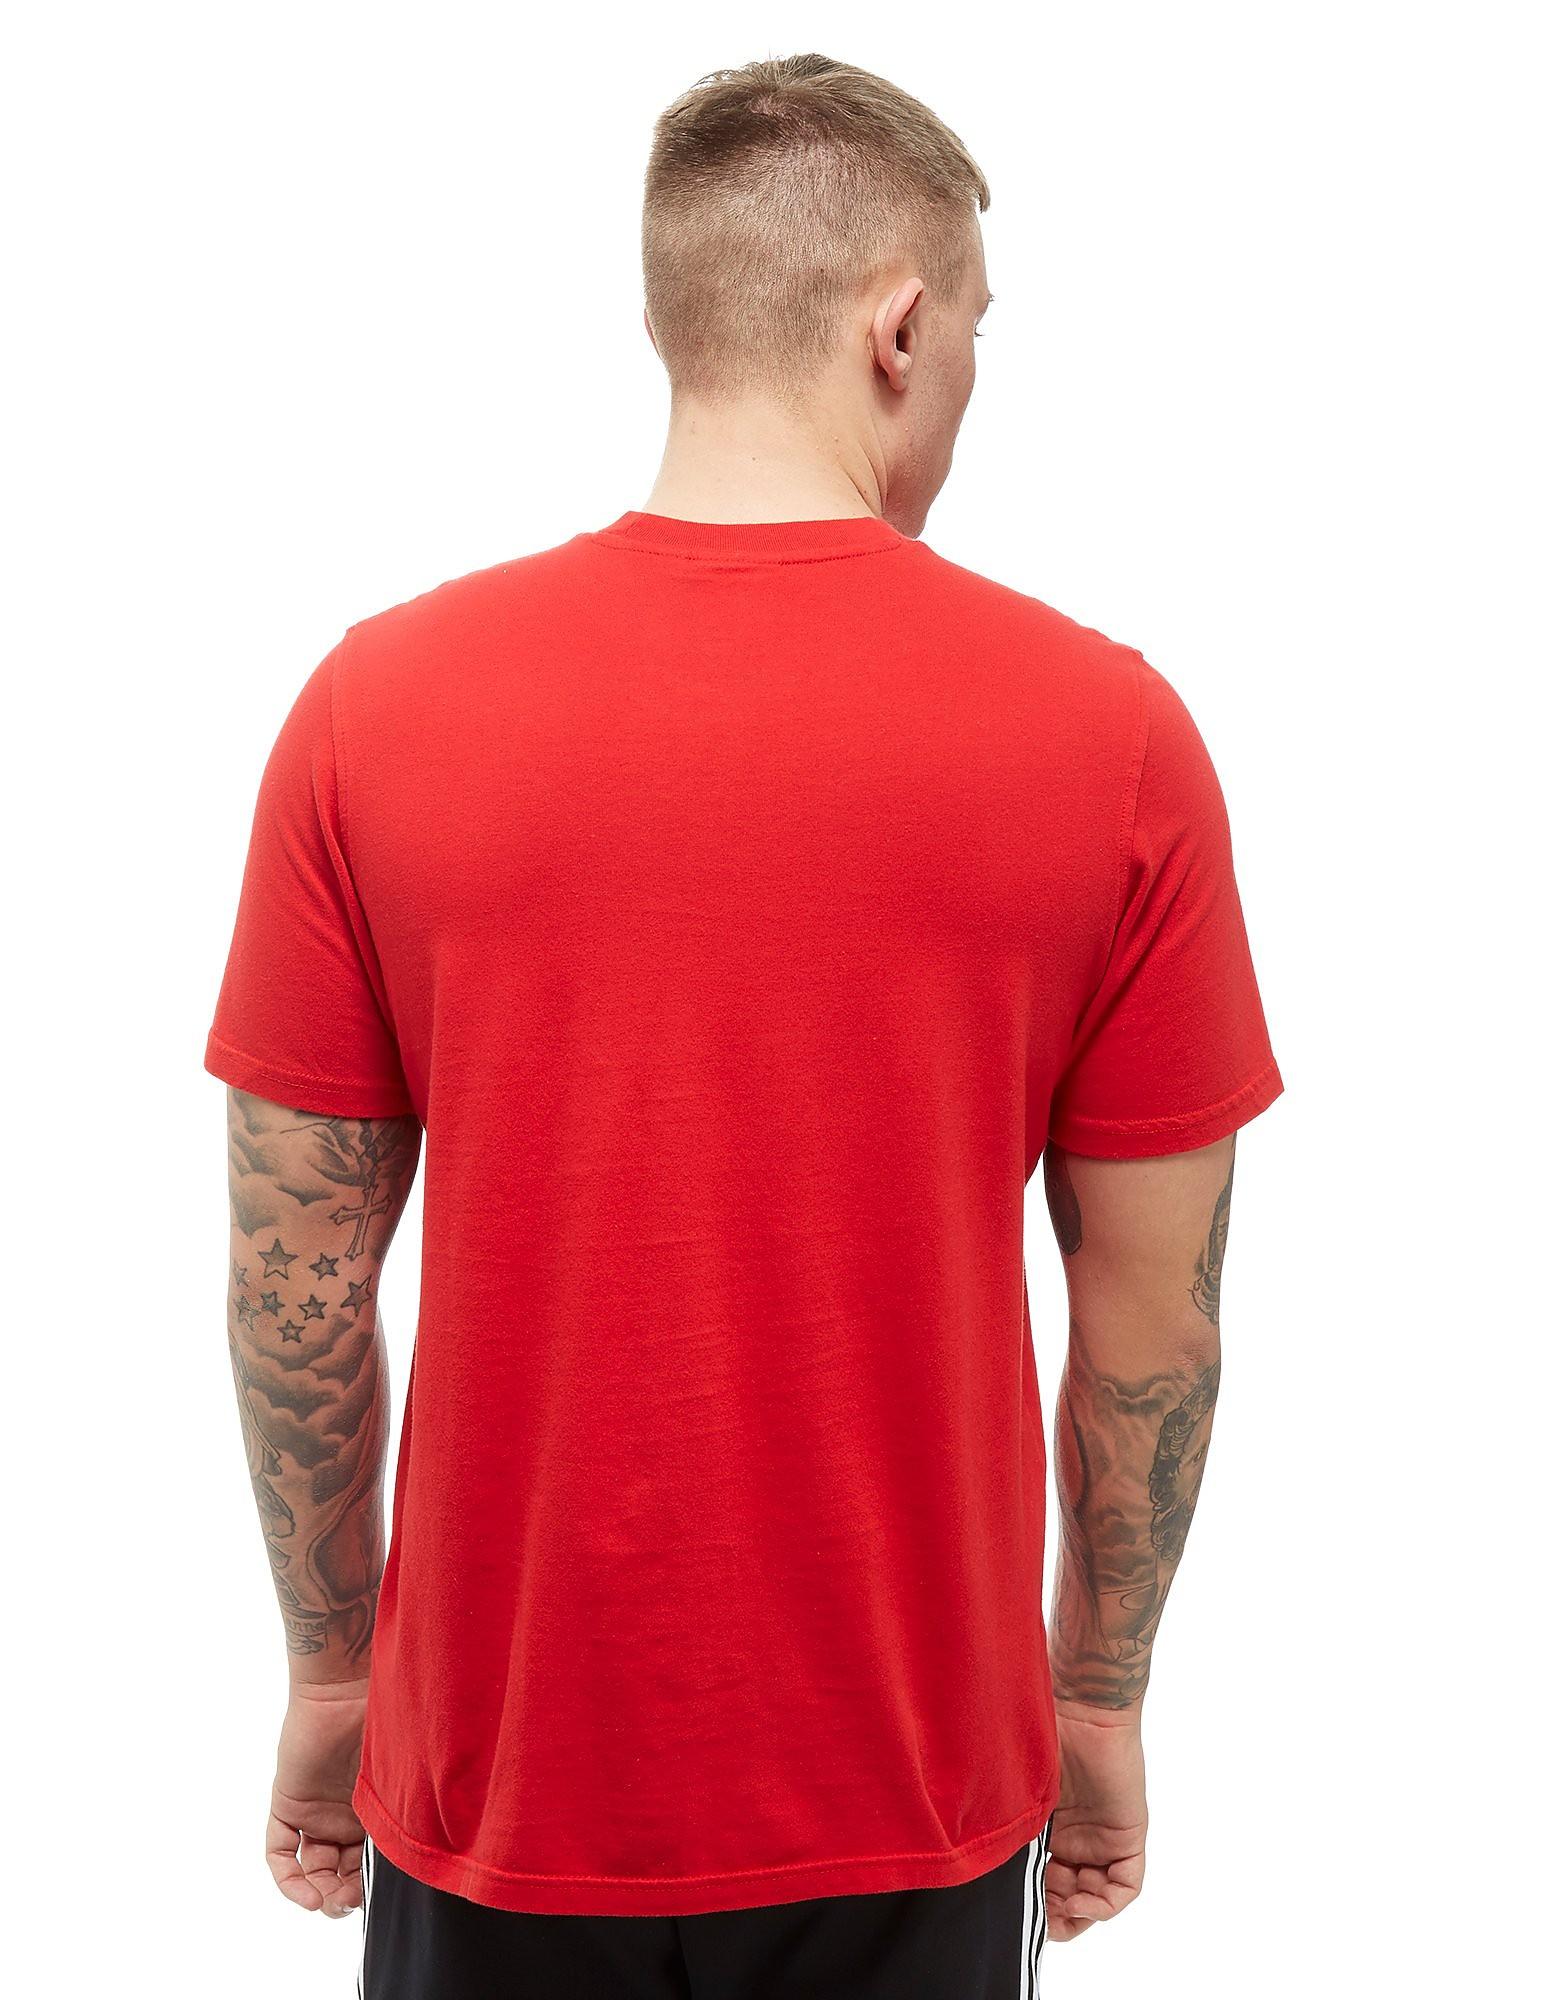 adidas Originals Trefoil State T-Shirt Heren